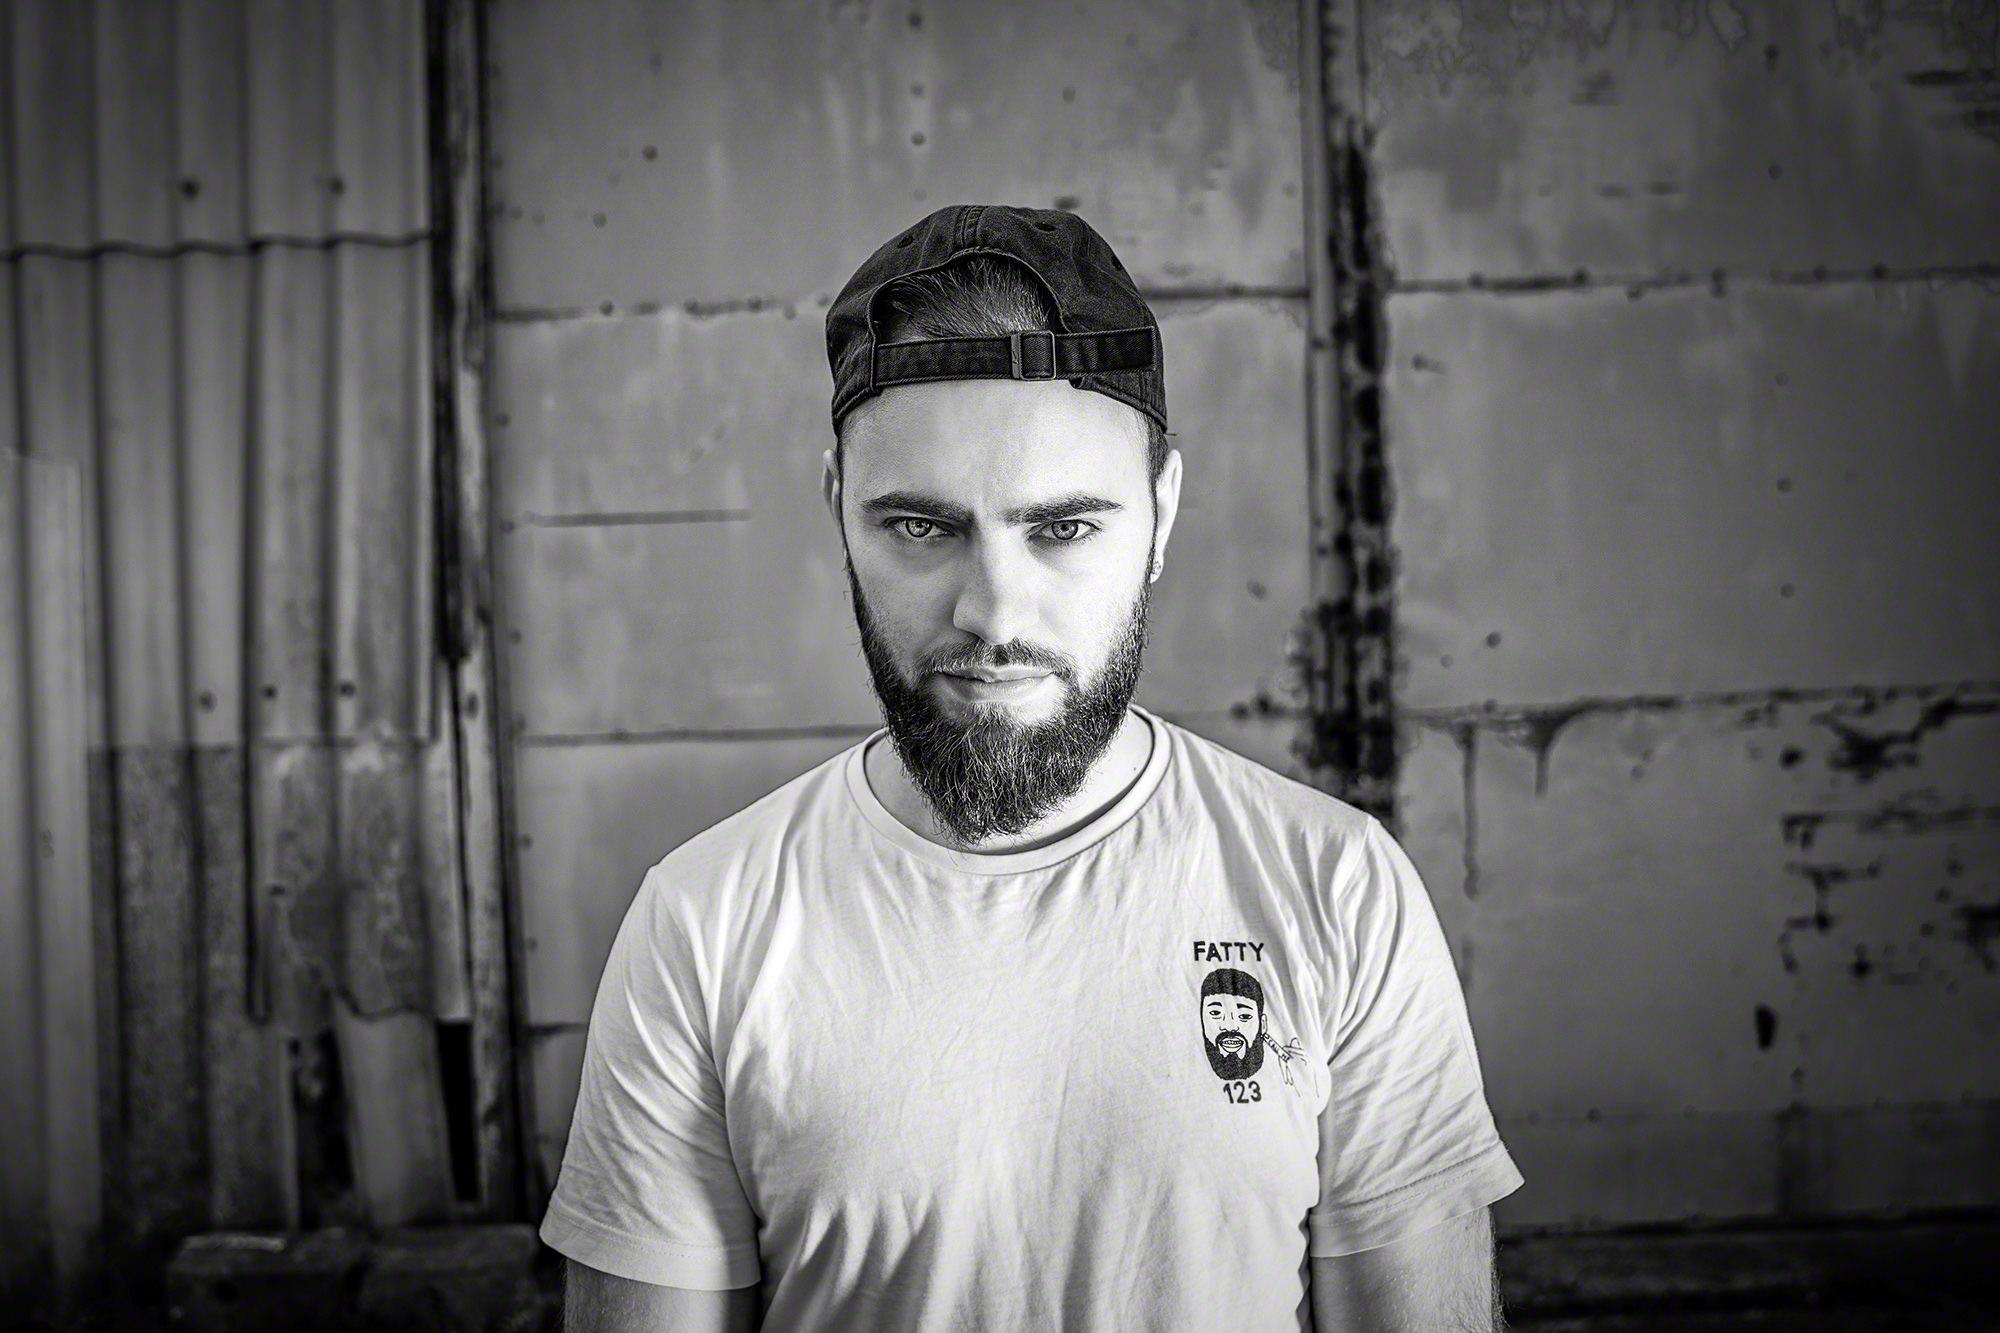 Fotoshooting Männerportrait